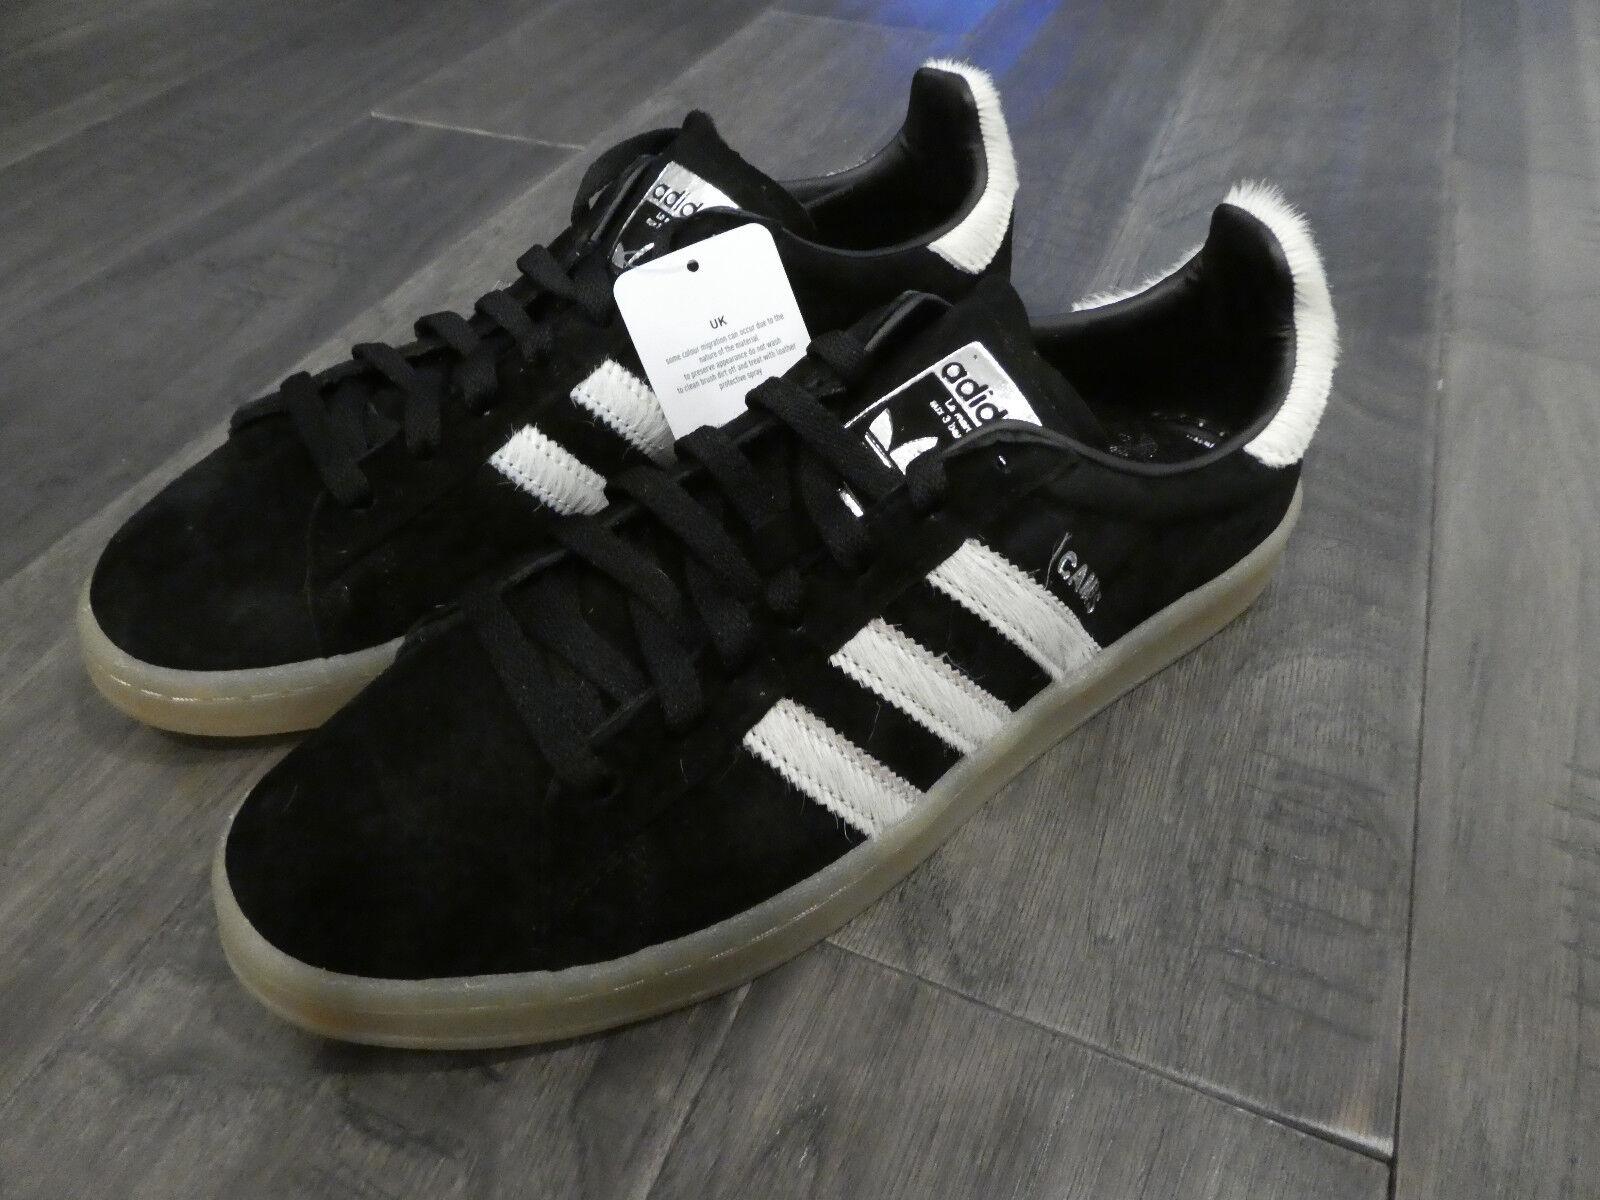 Adidas Campus Uomo shoes scarpe da ginnastica new BZ0071 Brown Gum White suede calf